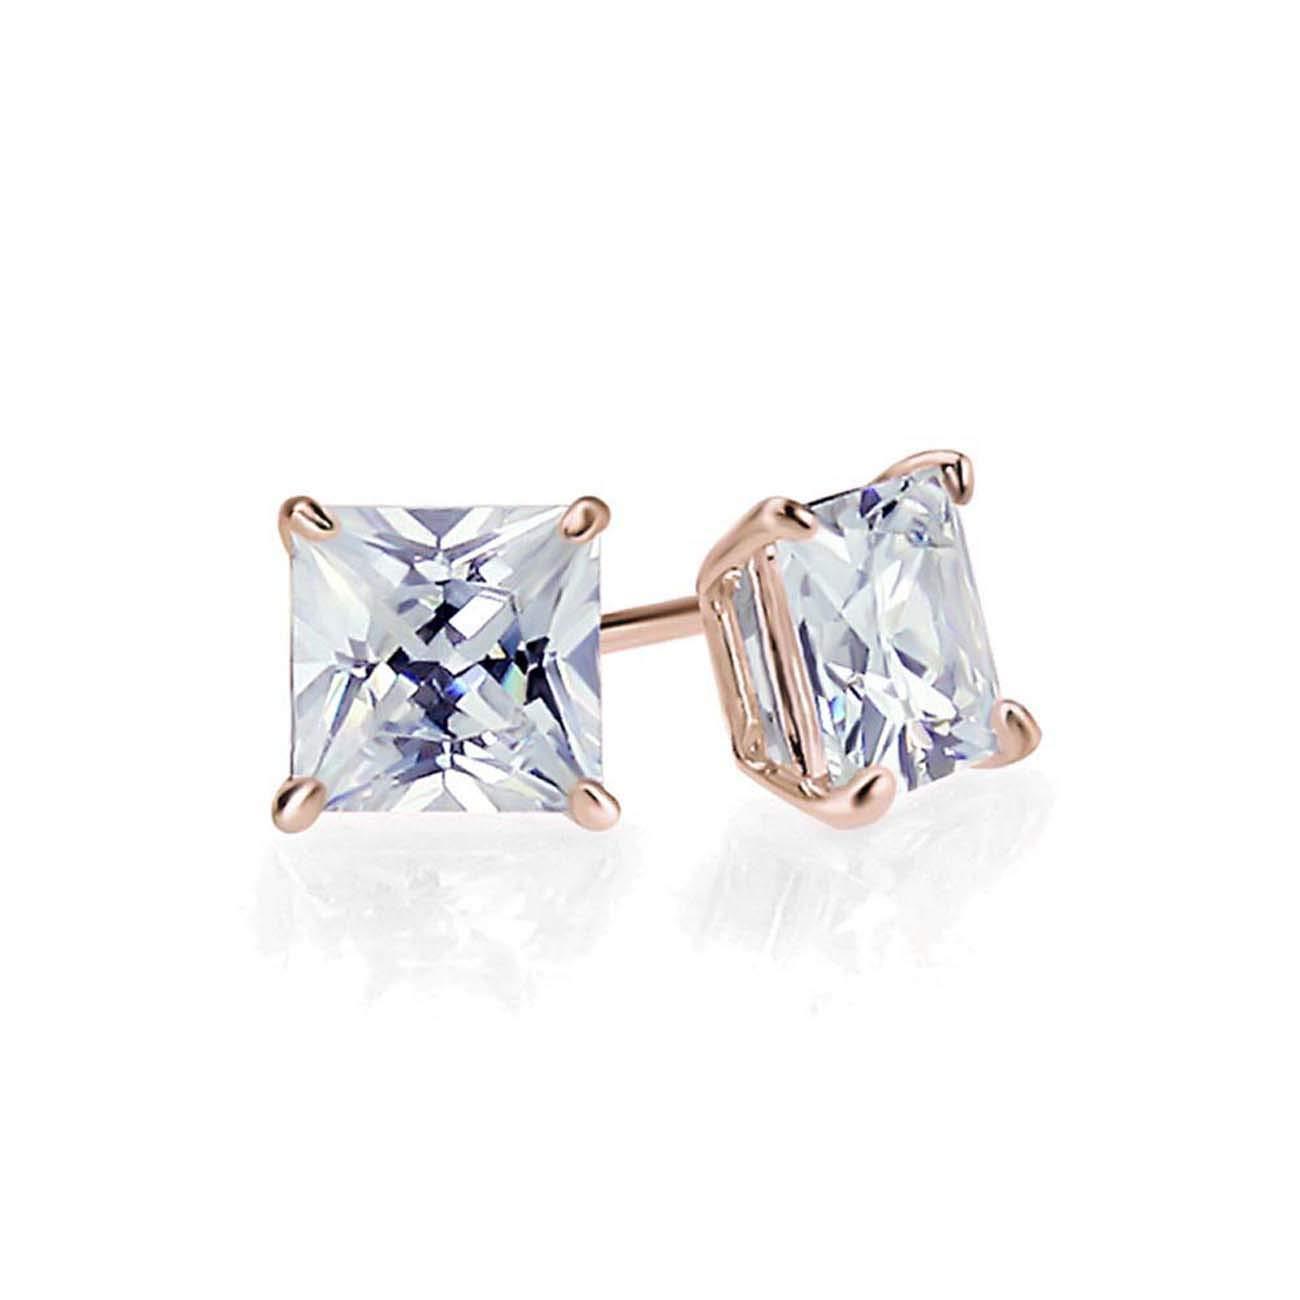 Wonderful 5mm Princess Cut Diamond Stud Earrings 14k Rose Gold Over .925 Sterling Silver For Womens